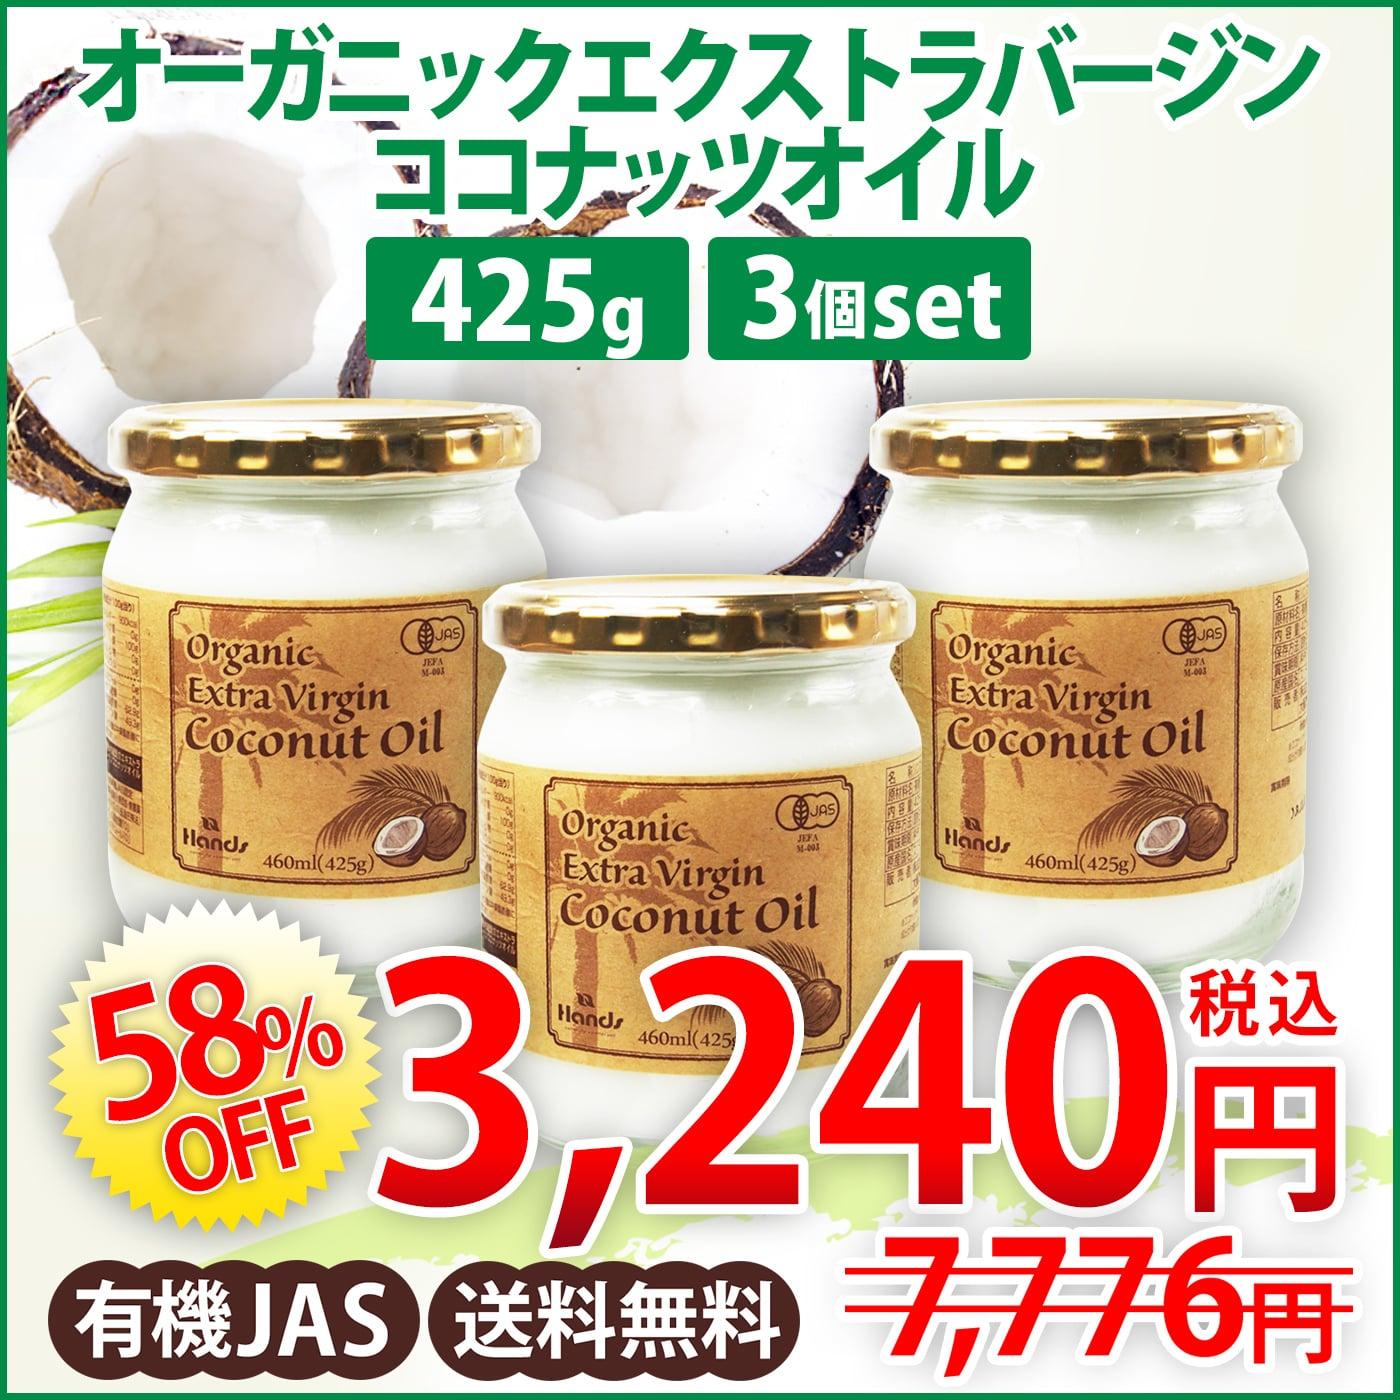 【61%OFF】国内充填!有機JAS認定 ココナッツオイル オーガニック エクストラ バージン ココナッツオイル 460mL(425g)×3個セット【HLS_DU】【RCP】